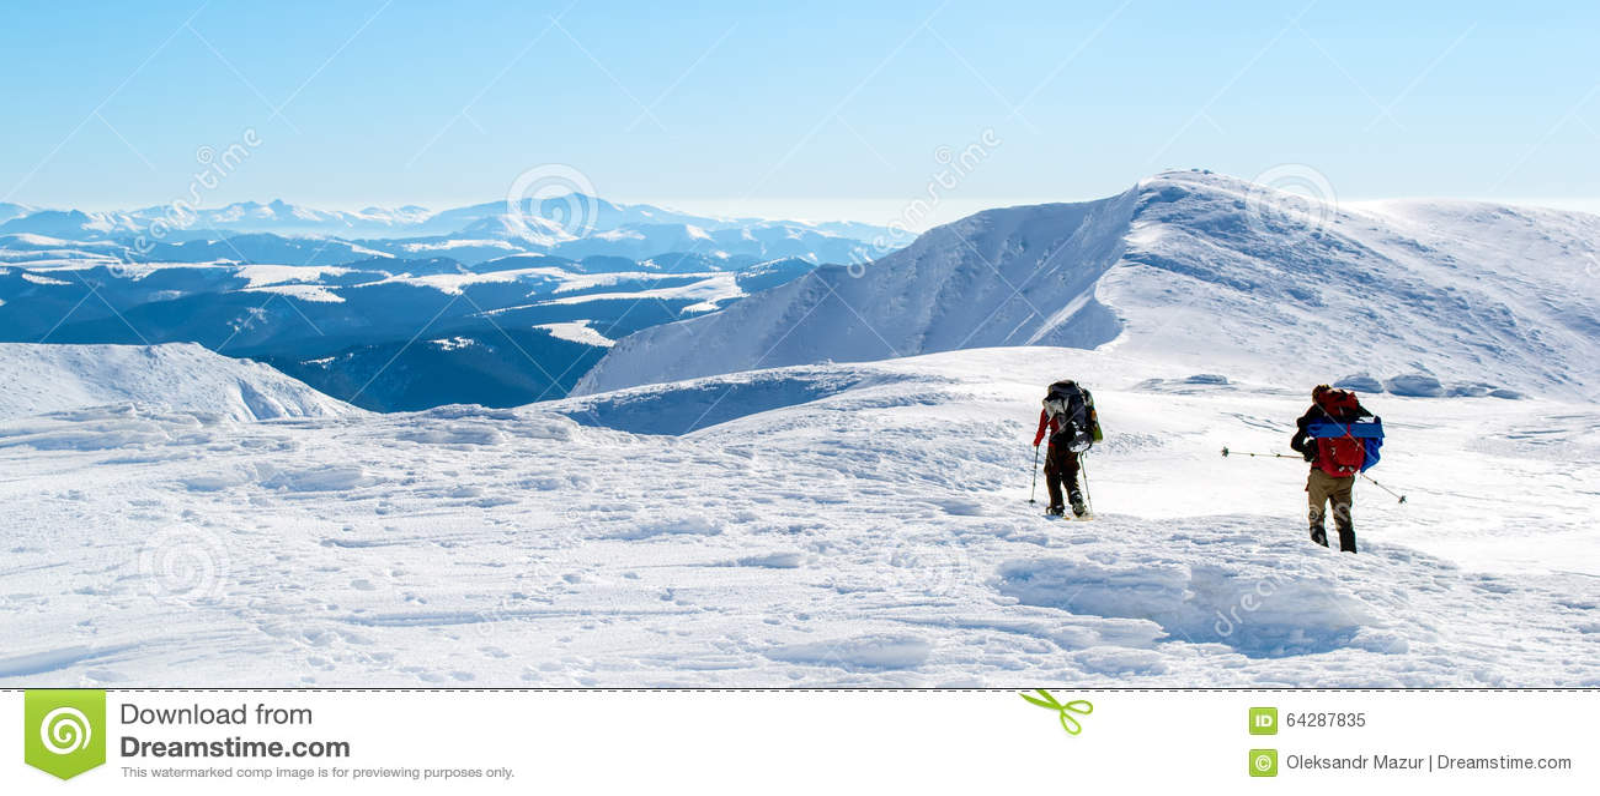 towards the snowy - photo #20